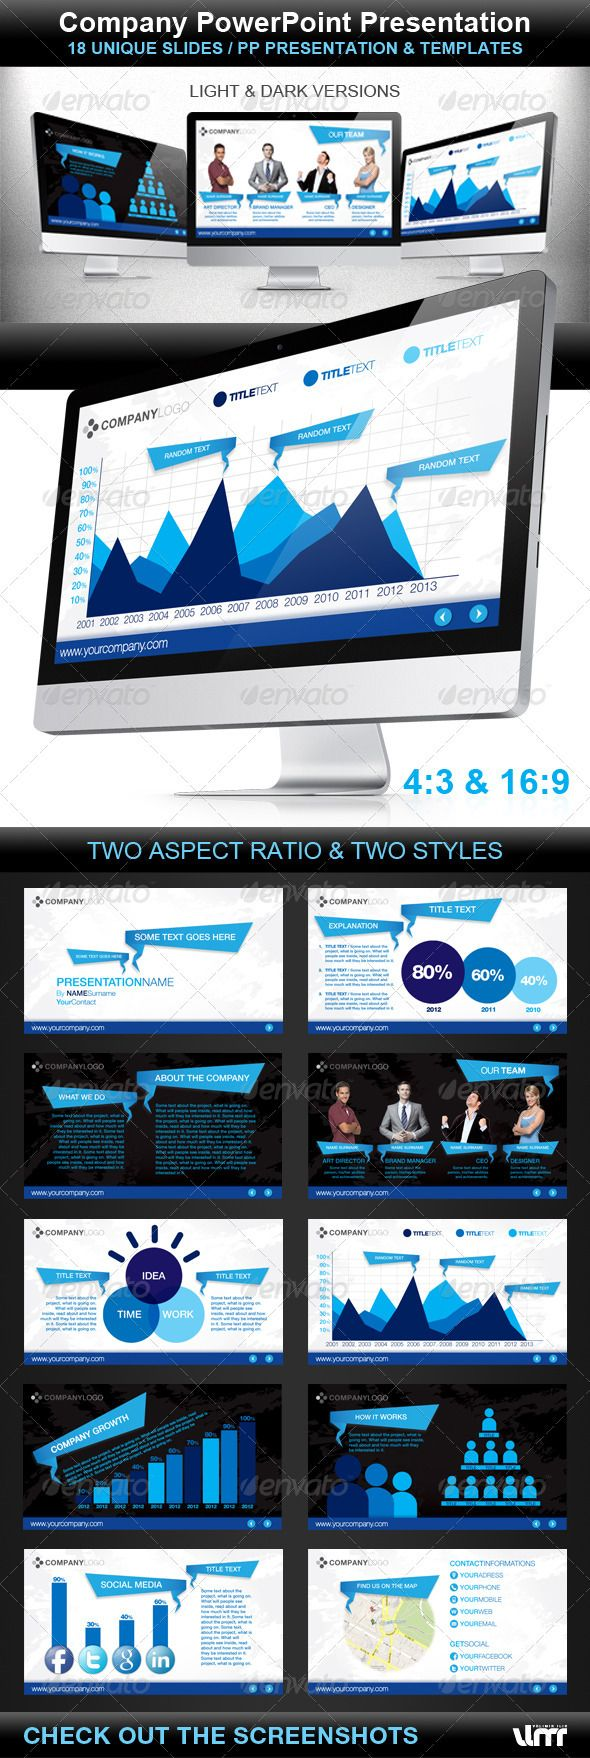 152 best powerpoint / keynote images on pinterest | presentation, Presentation templates